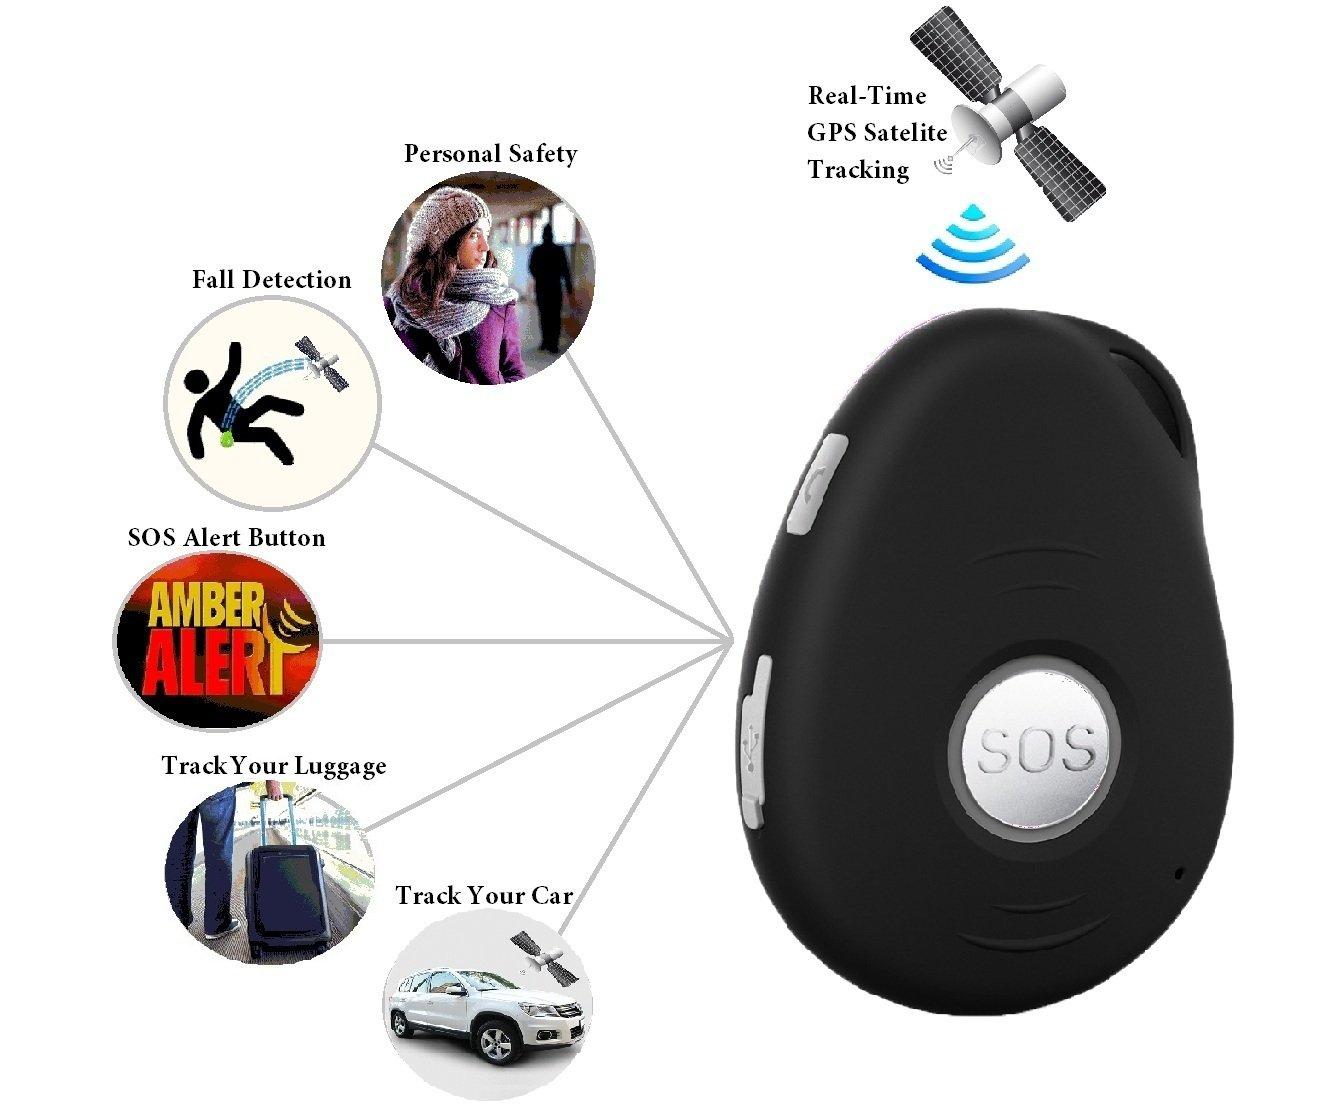 Amazon.com: 3 g visionone GPS Tracker/alarma personal ...